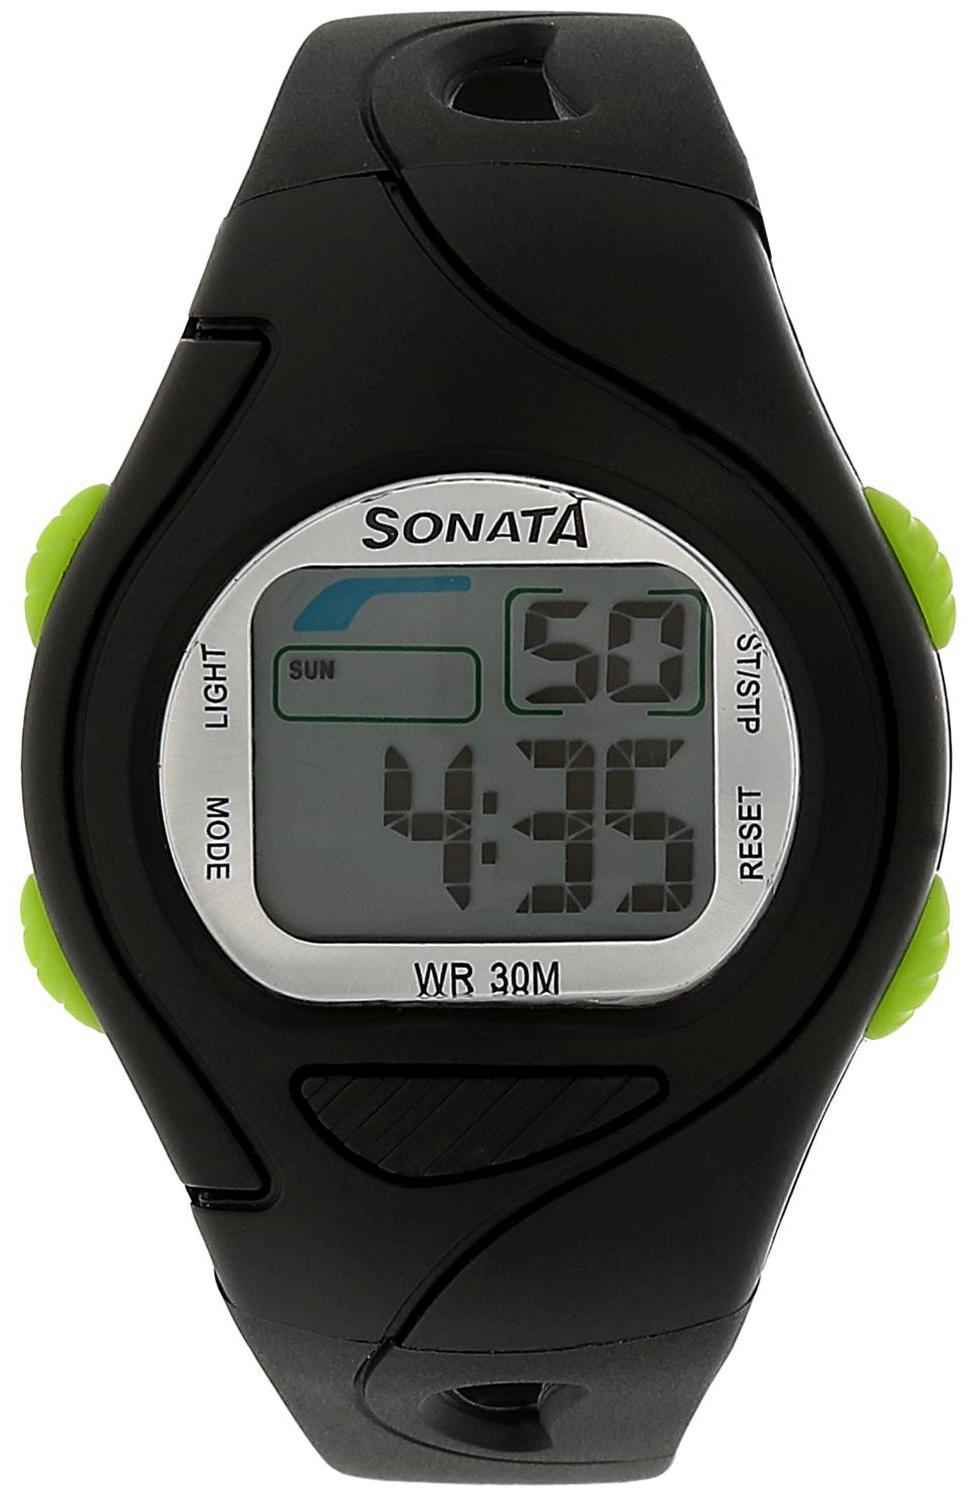 Sonata Digital Watch for men by Titan Company